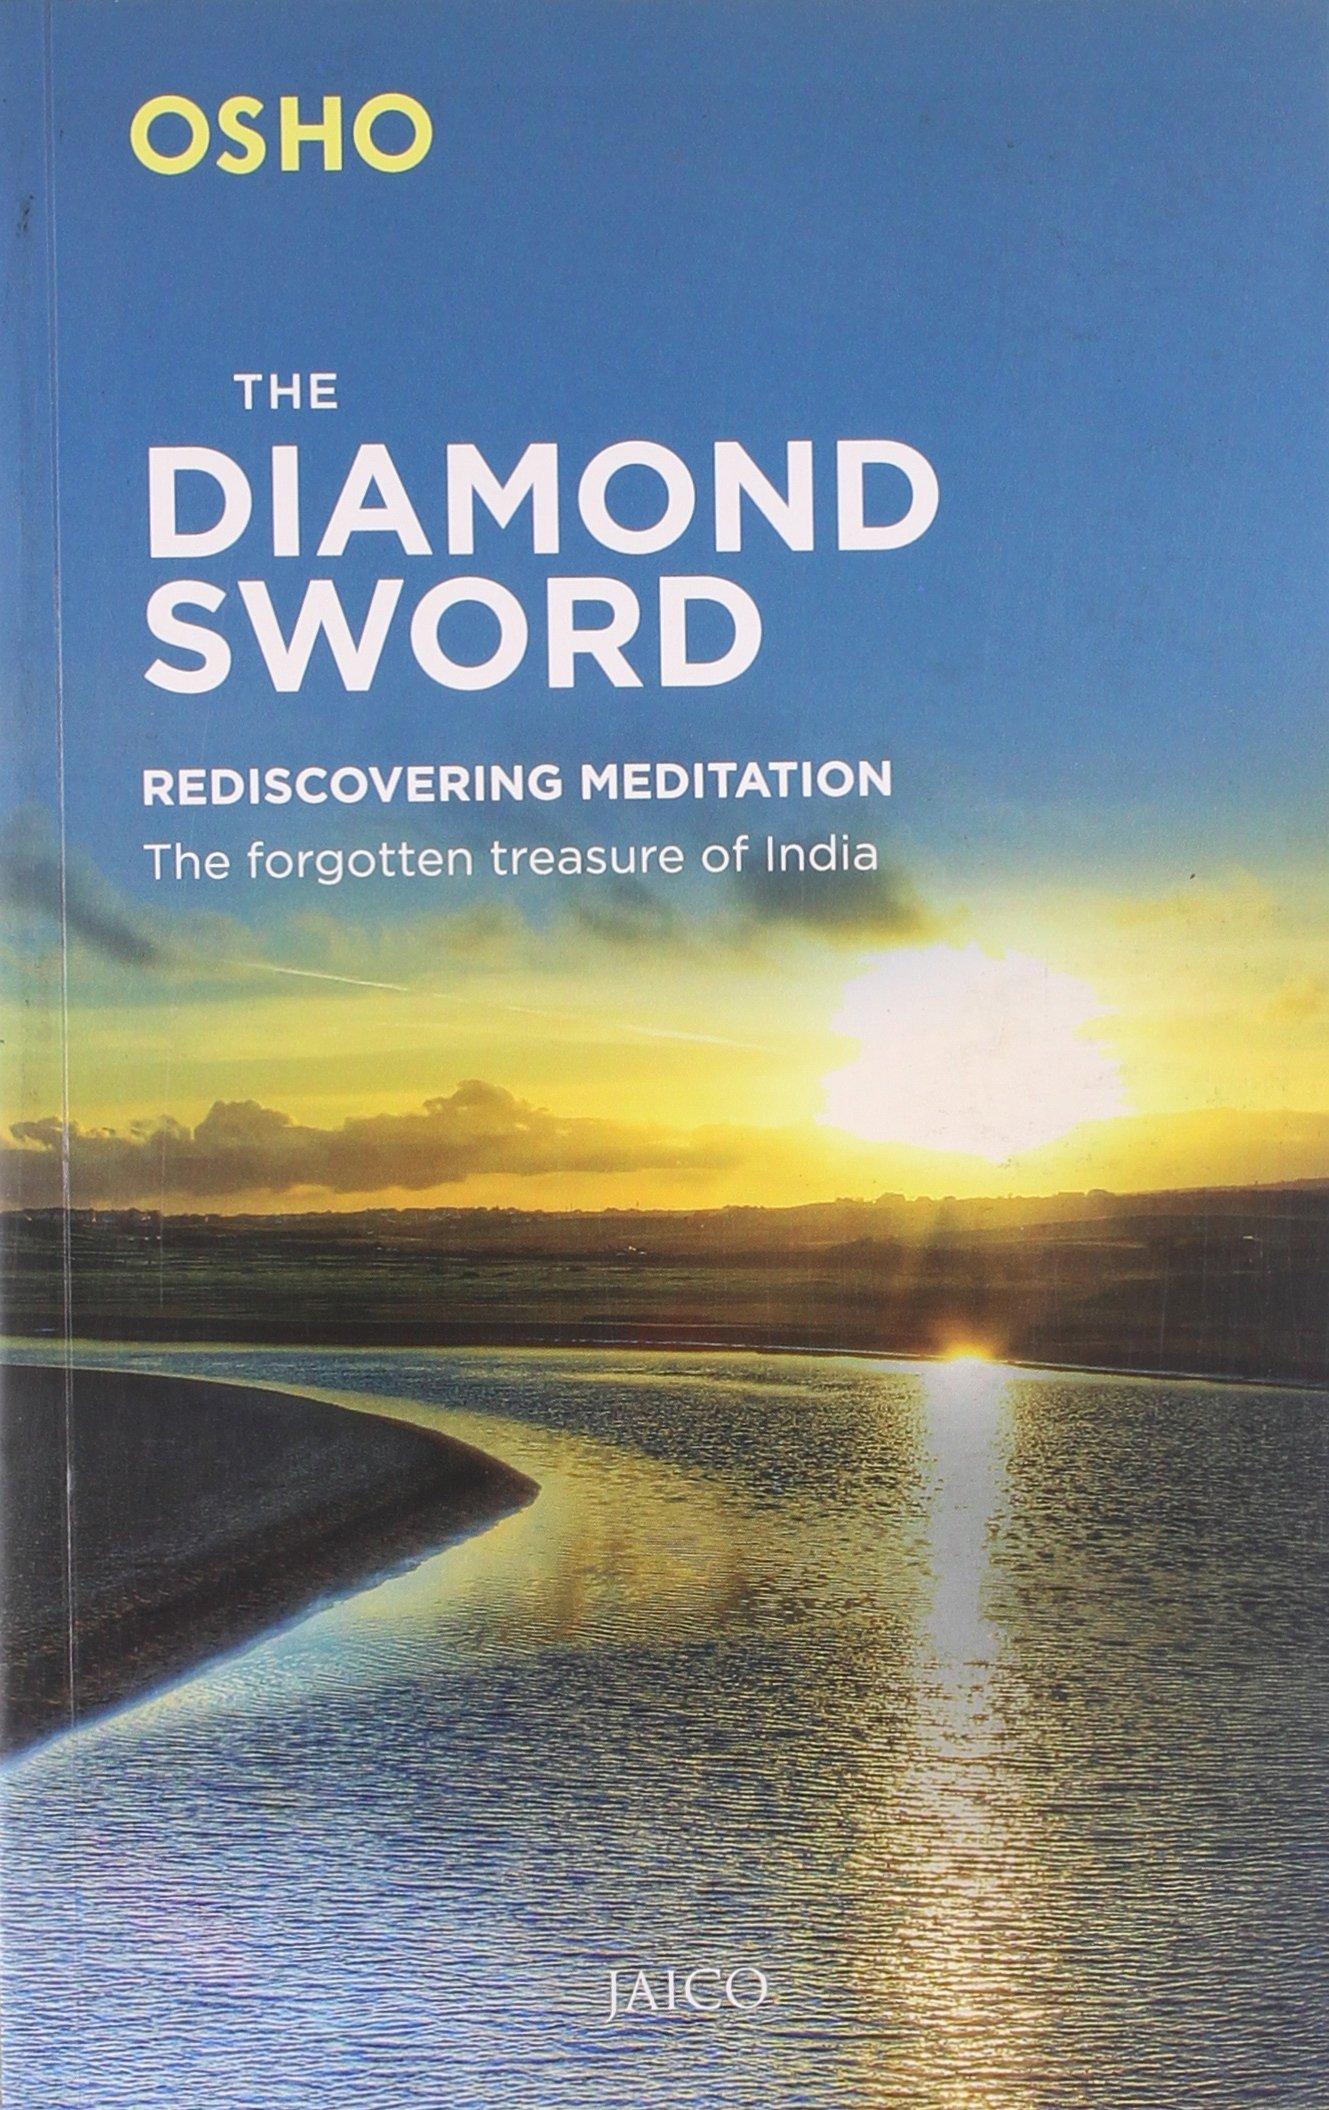 THE DIAMOND SWORD